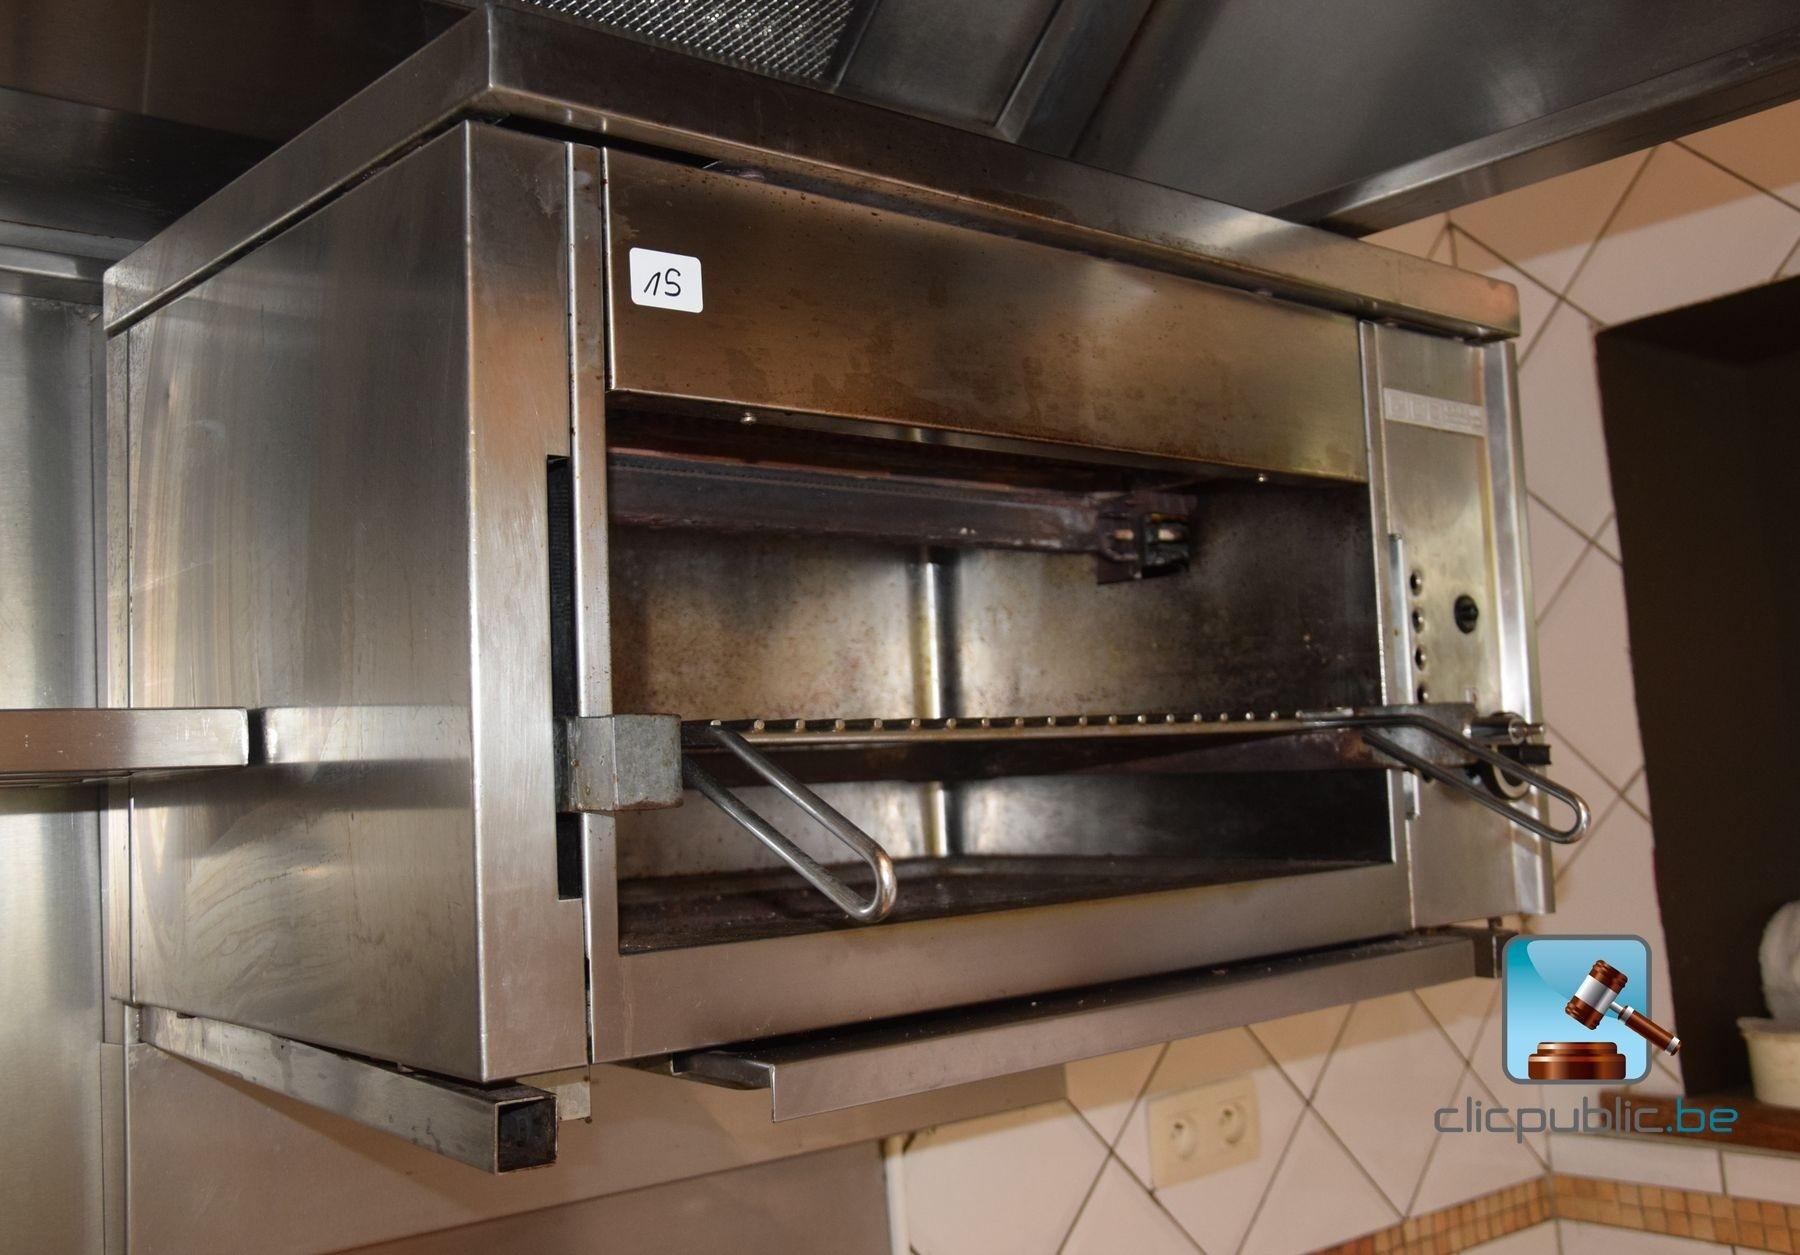 Salamandre de cuisine gigo collin au gaz ref 15 - Salamandre cuisine occasion ...